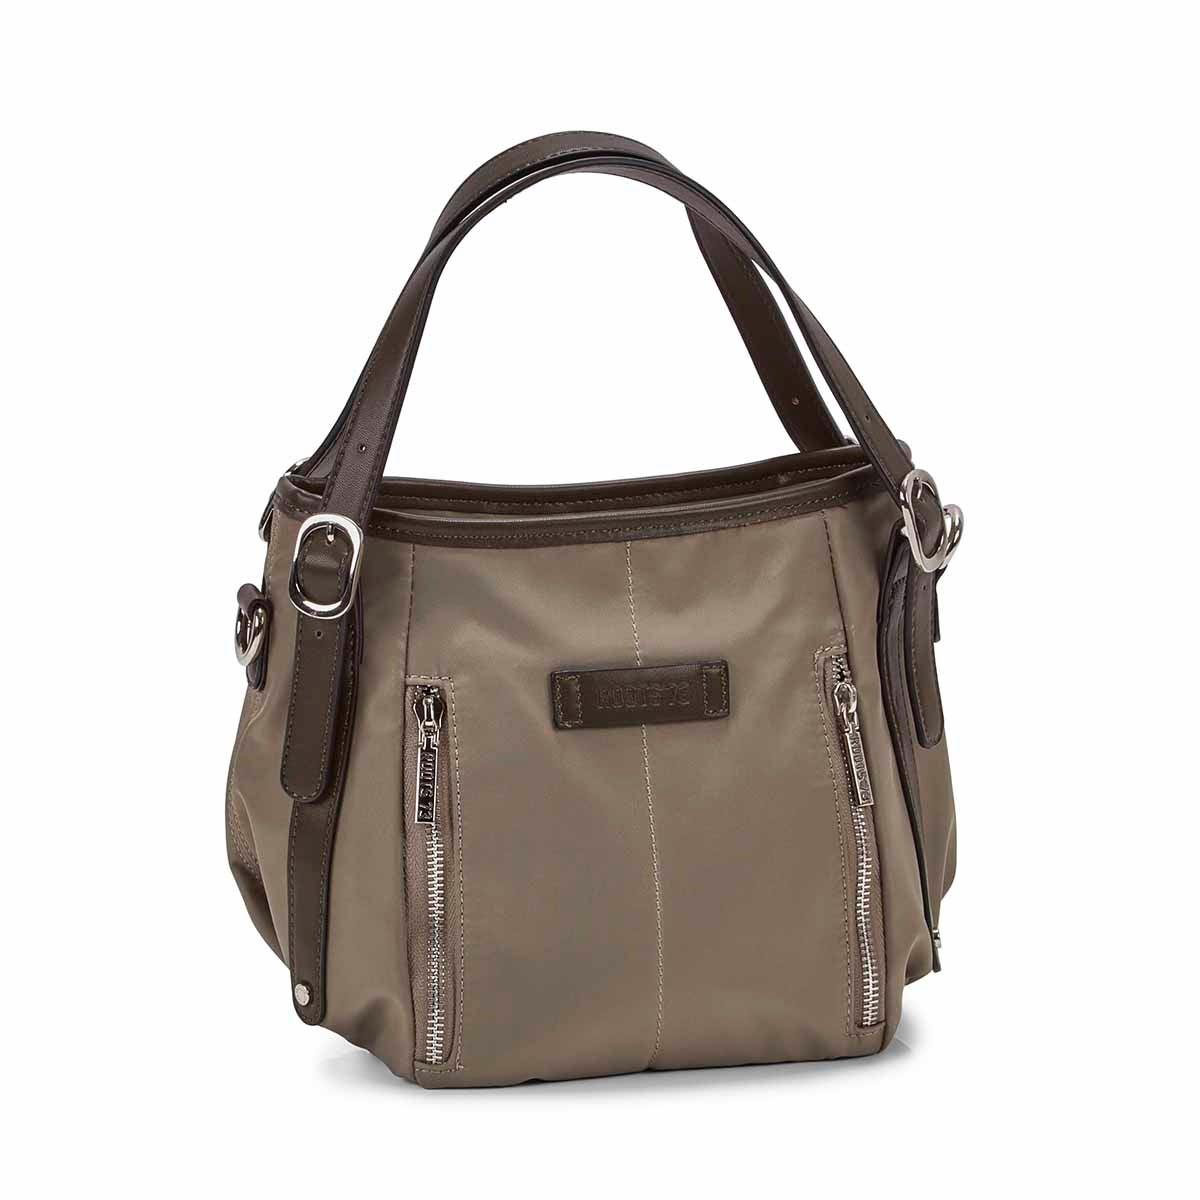 Women's R5298 khaki small satchel